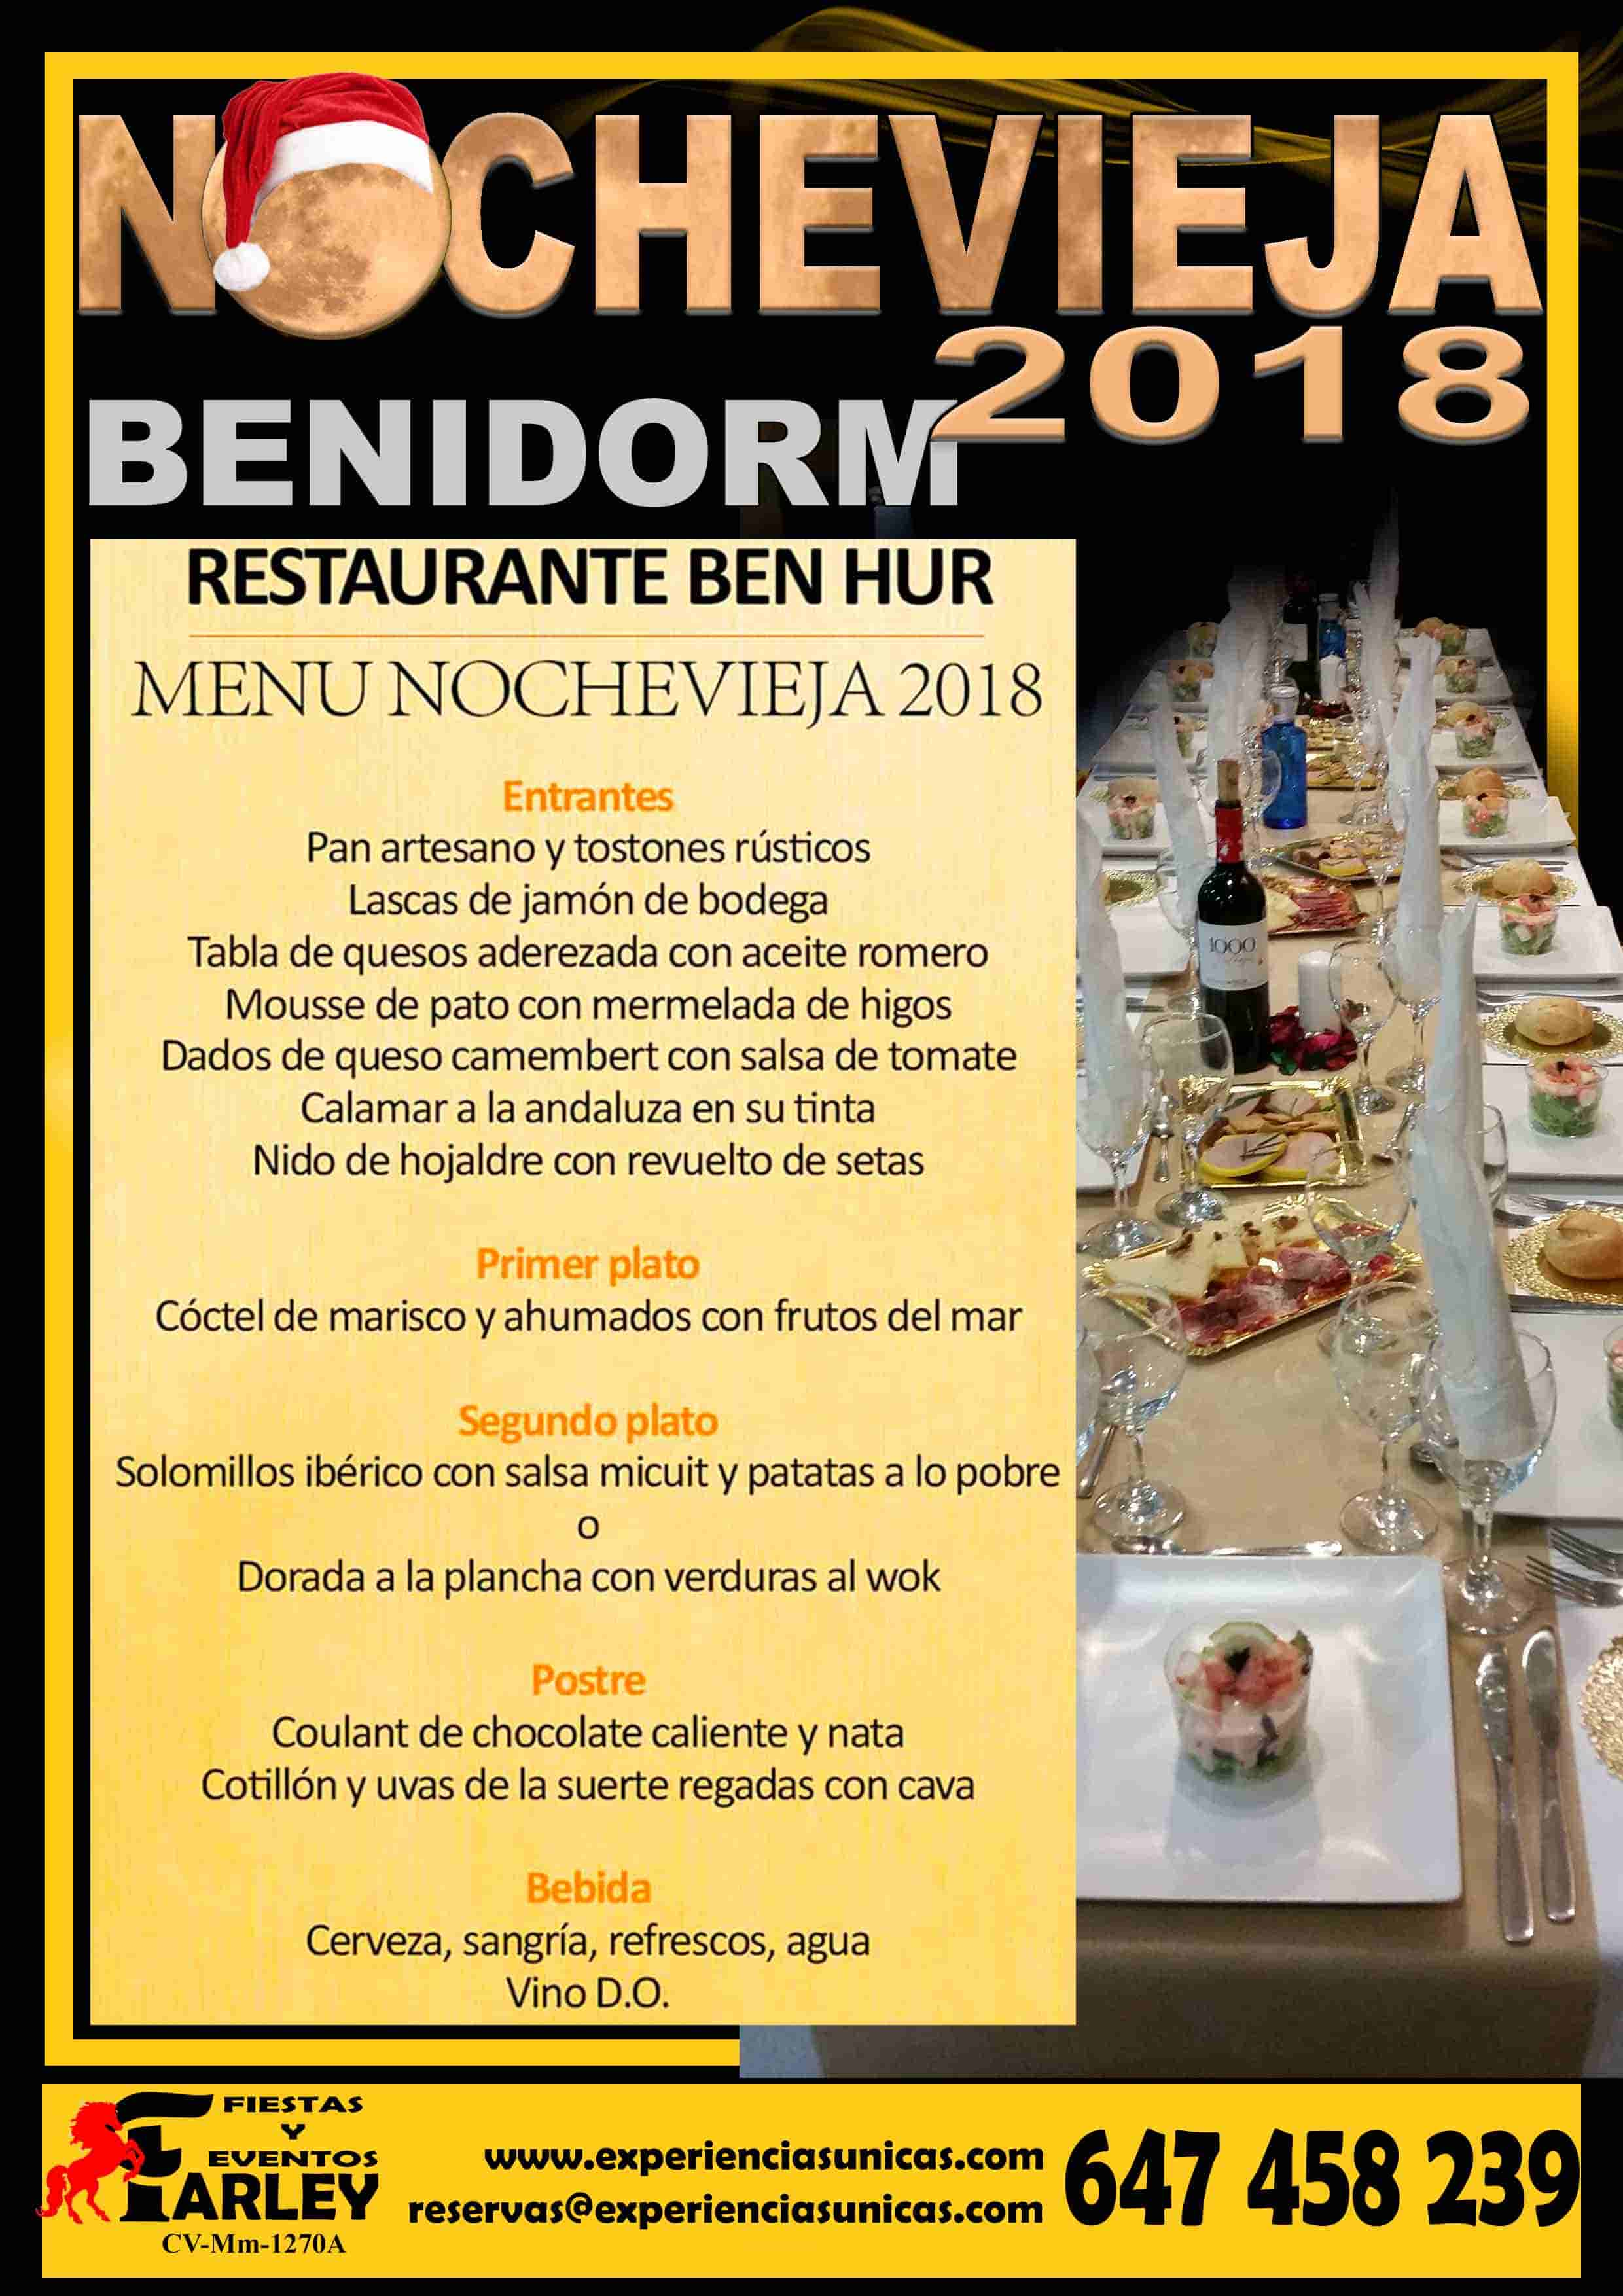 Restaurante Ben Hur Benidorm menu nochevieja